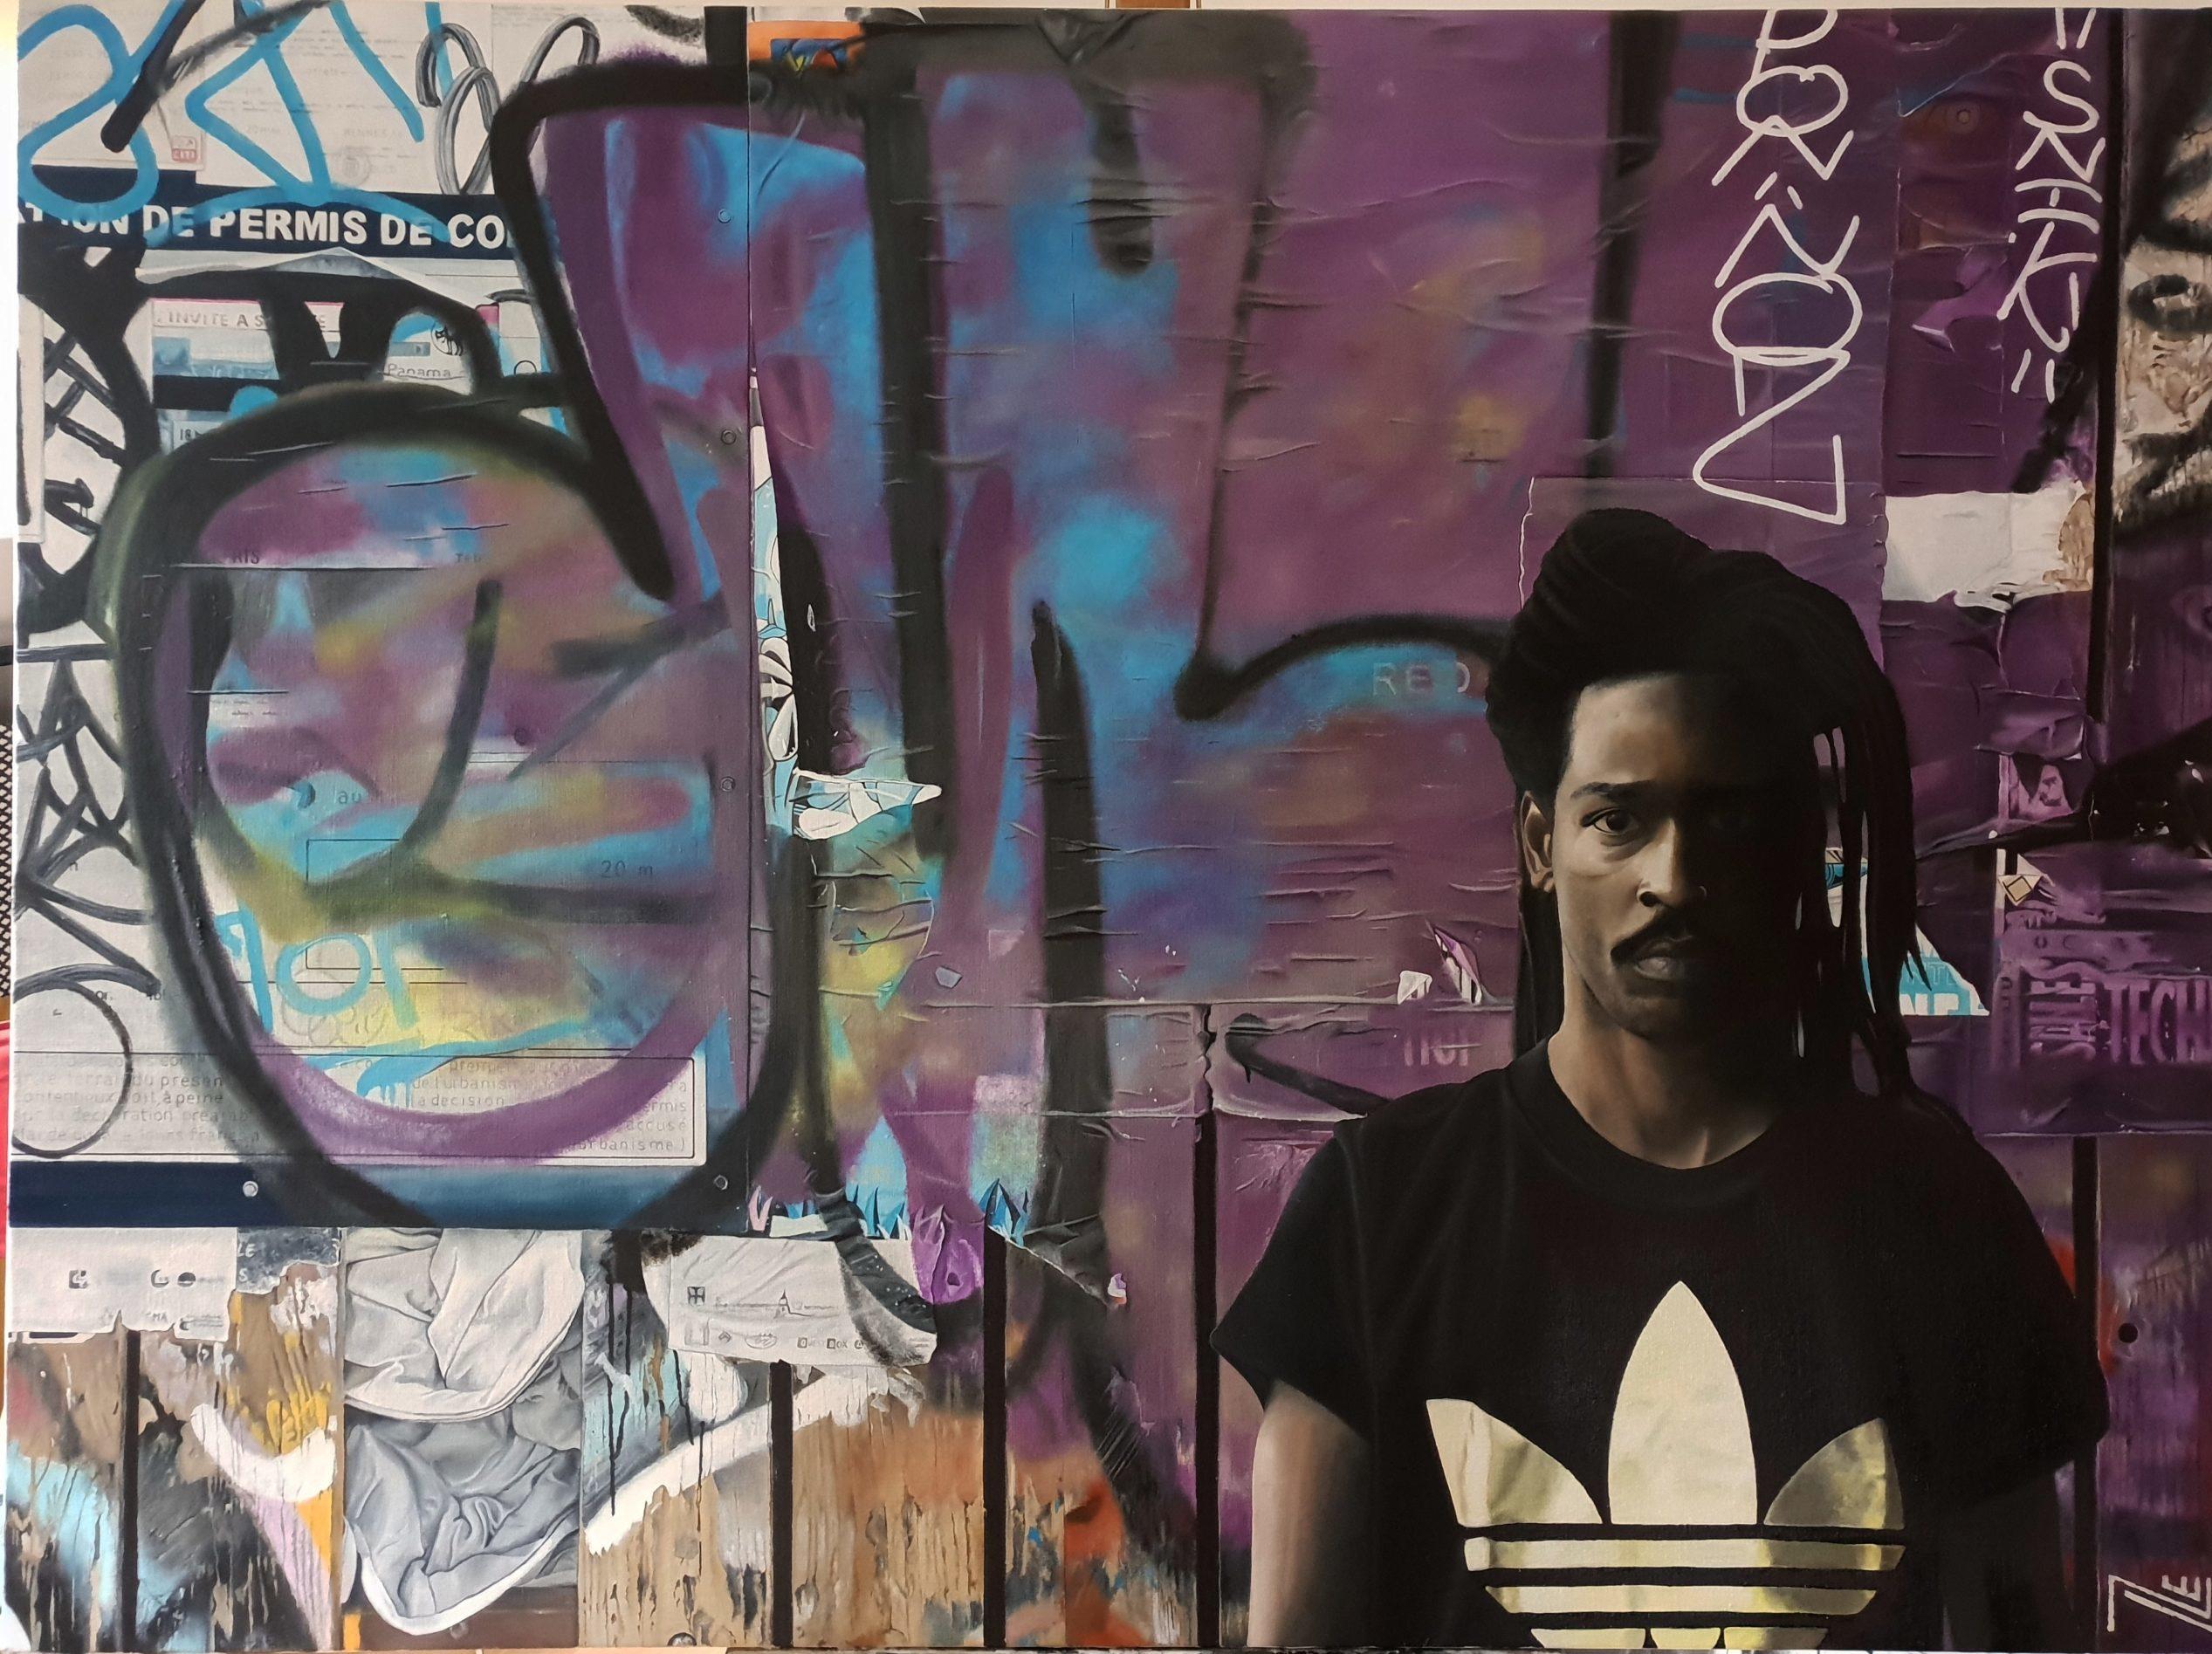 Nicolas Clézio hyper réalisme graffiti tag street art